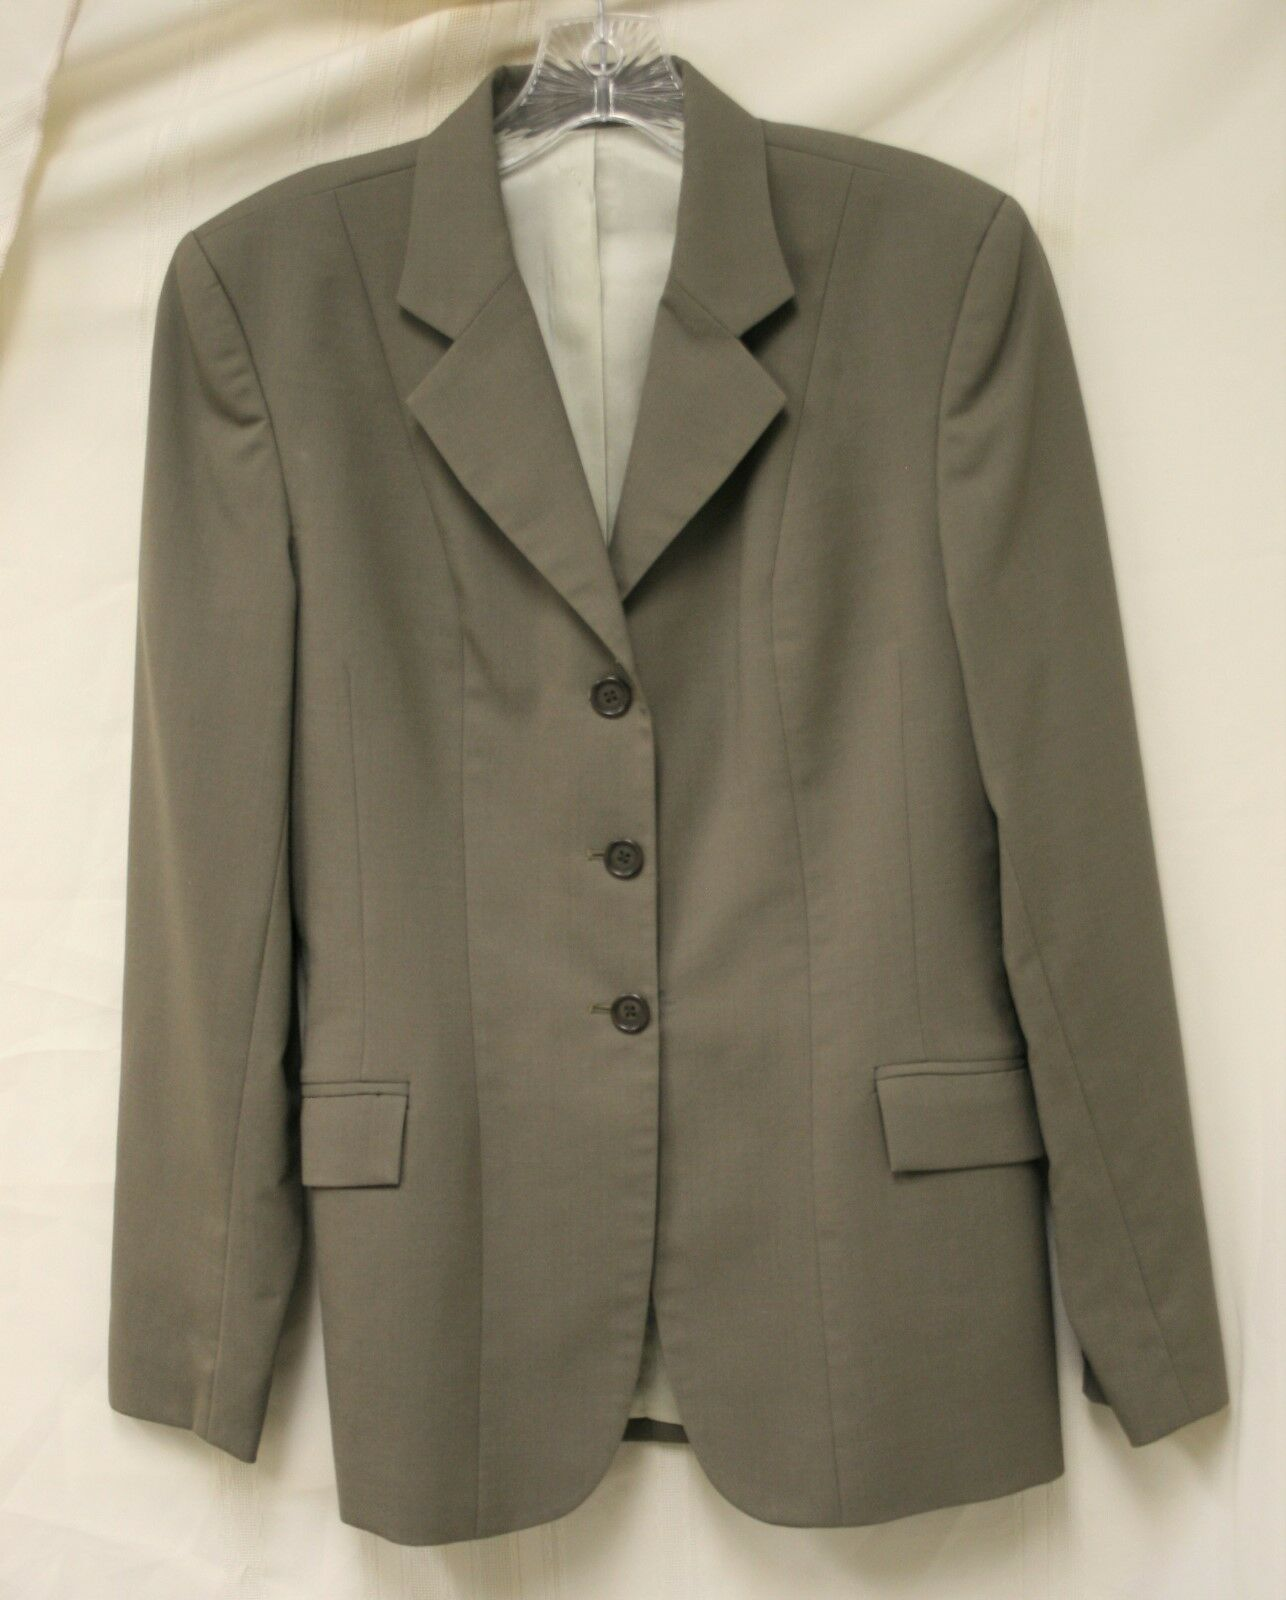 USED Marigold Hunt Seat Show Coat - Size 12, Taupe